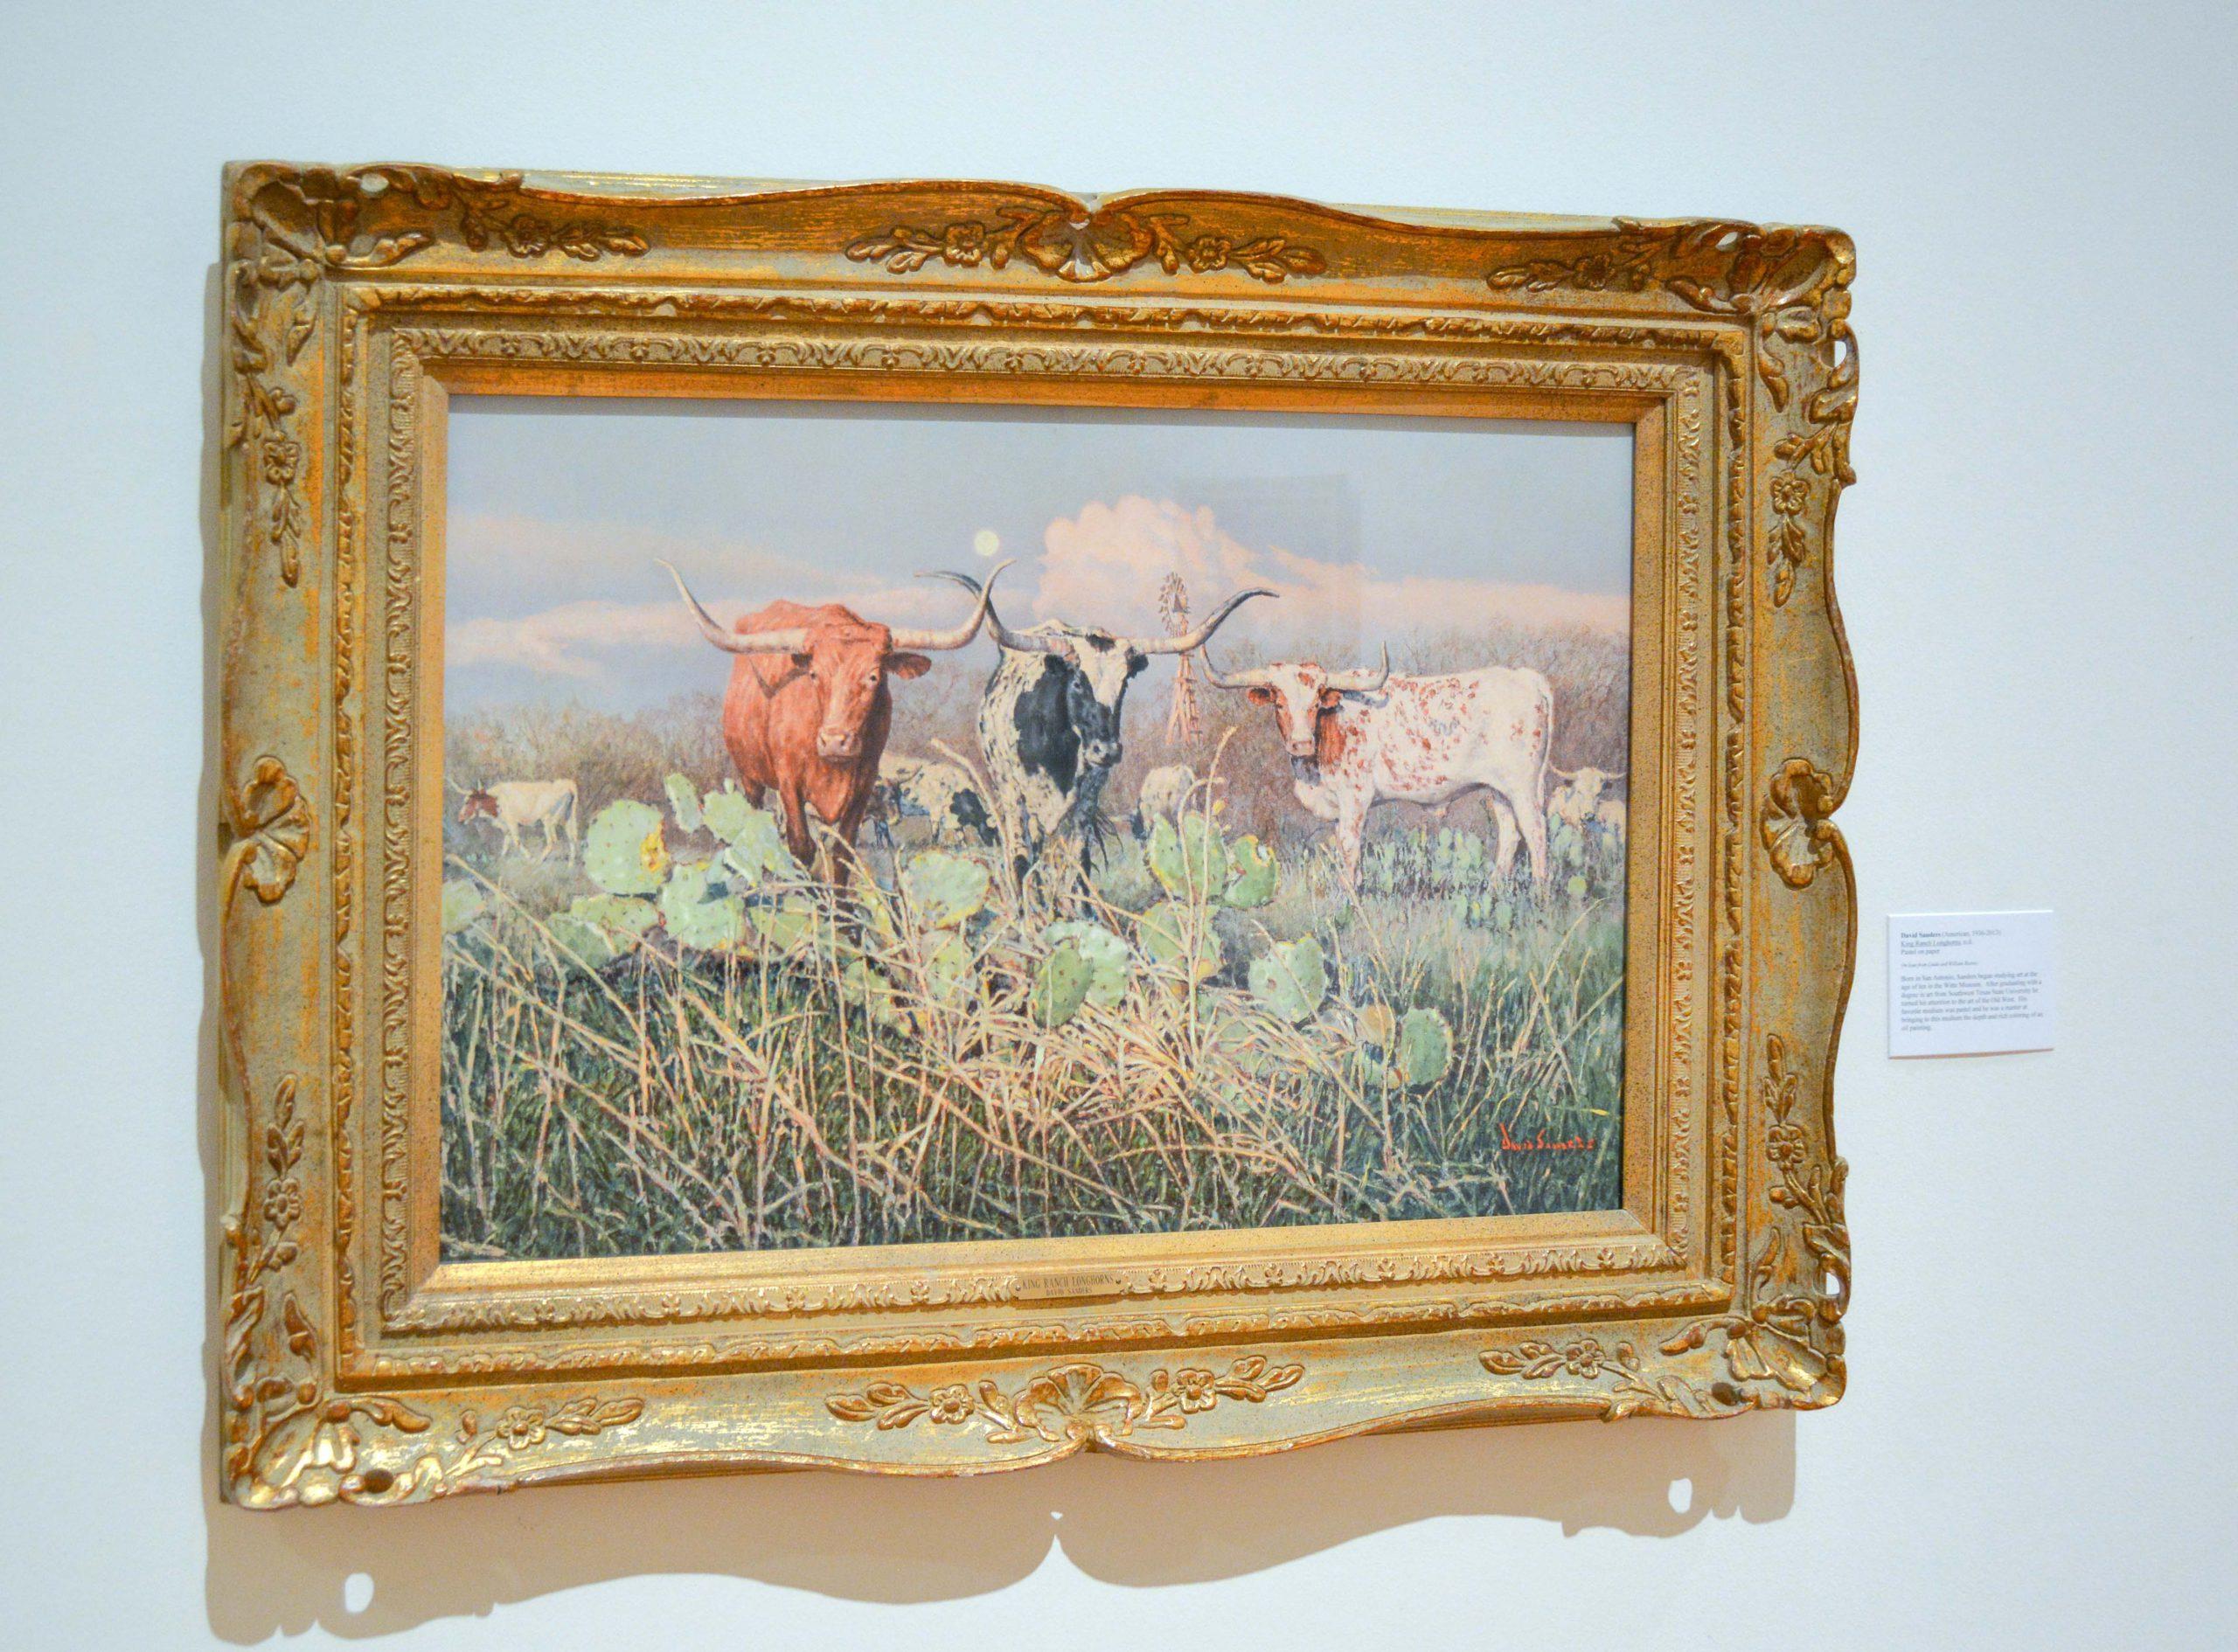 Longhorn cattle near cactus